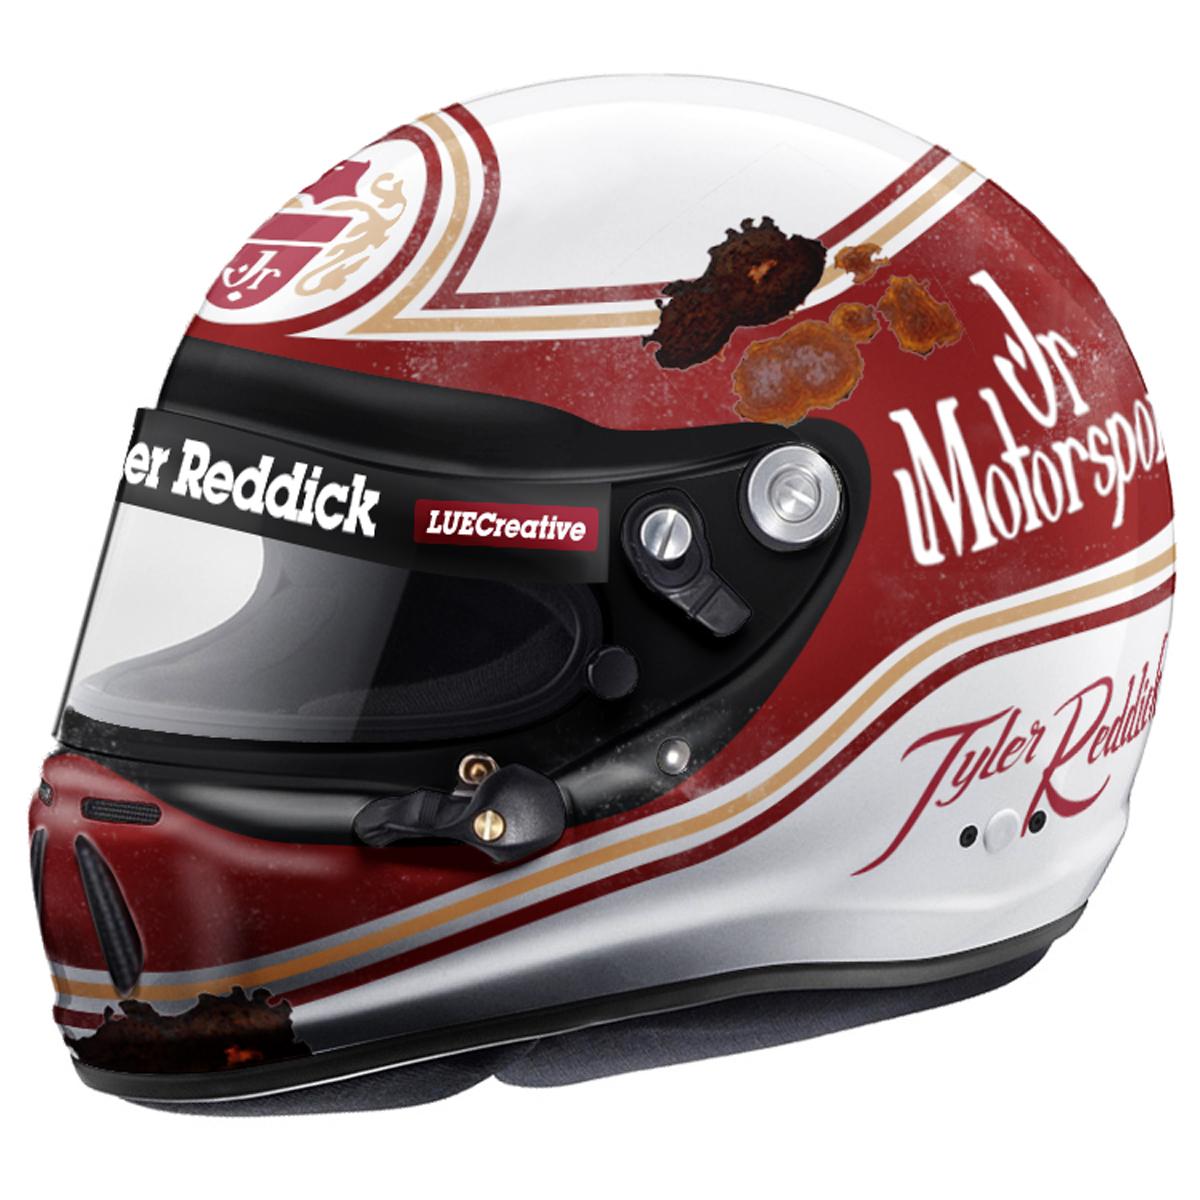 Reddick_Tb_Helmet.jpg